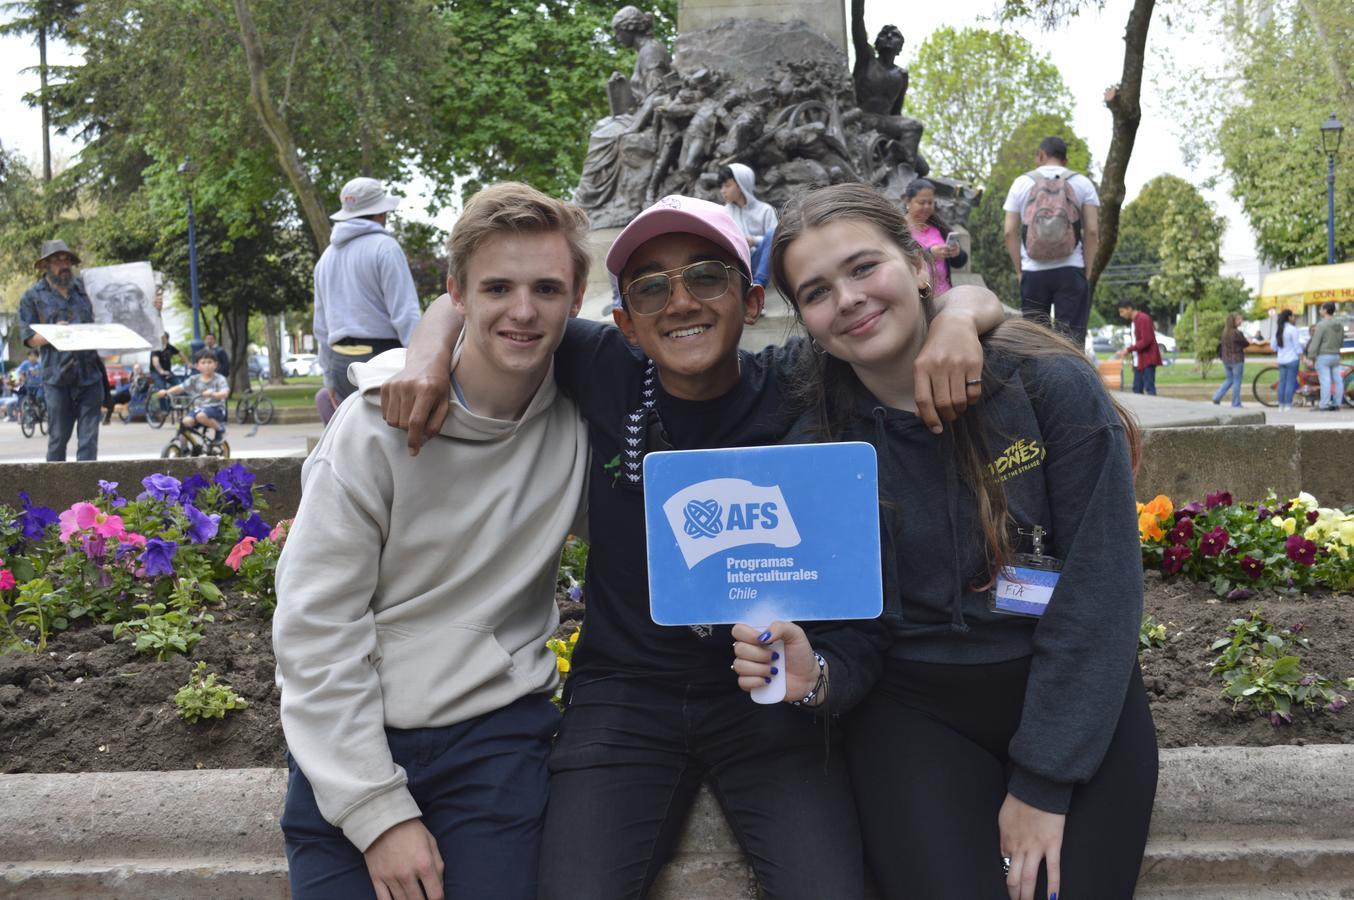 Mika Heide de Alemania, Omar Ursilan Afandi de Malasia y Fia Poulsen de Dinamarca